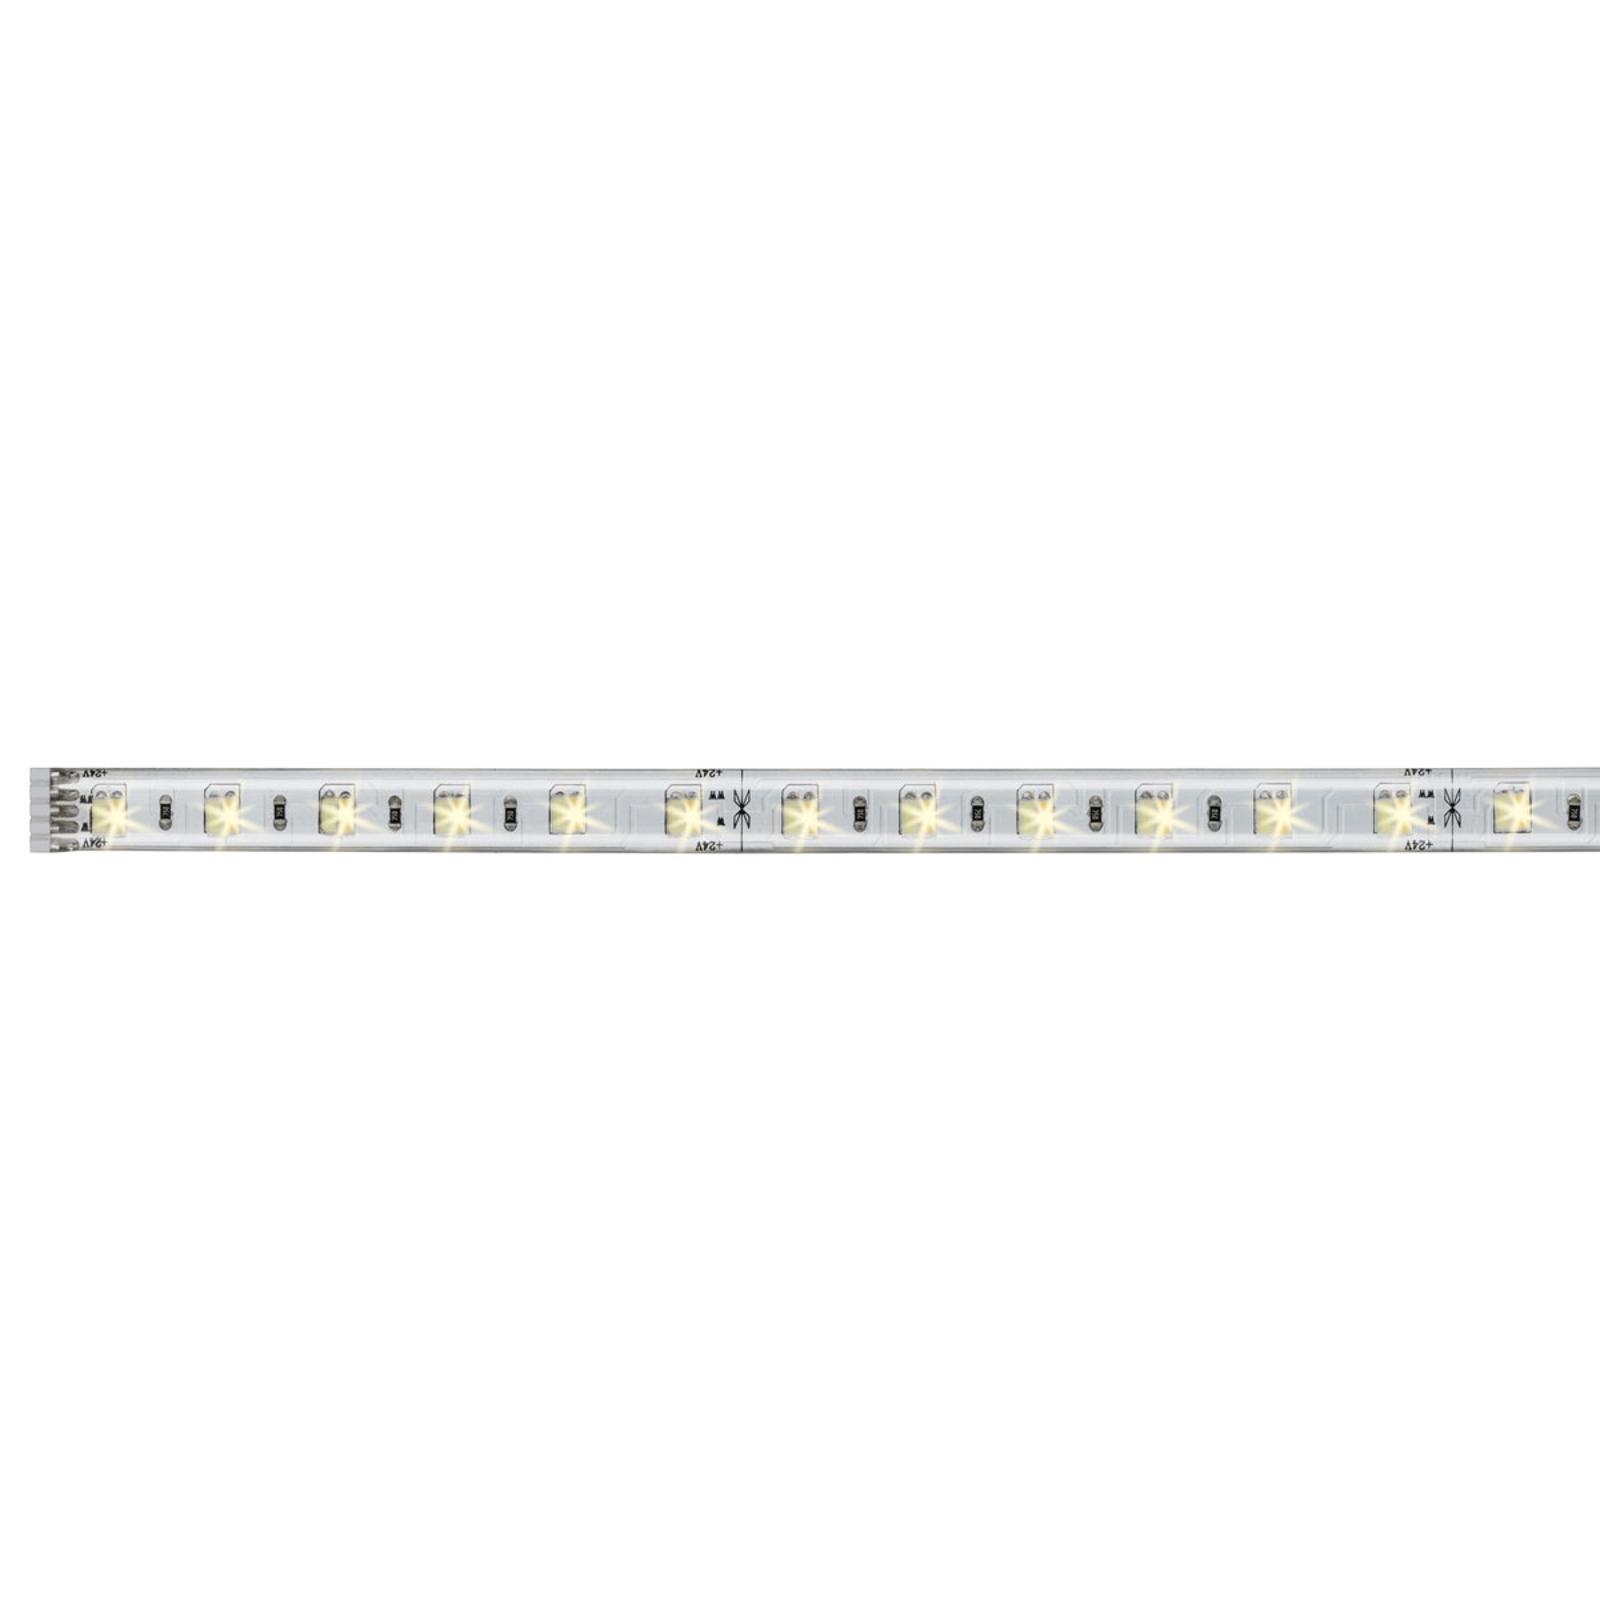 Prolunga strip LED Max 100 cm bianco, regolabile